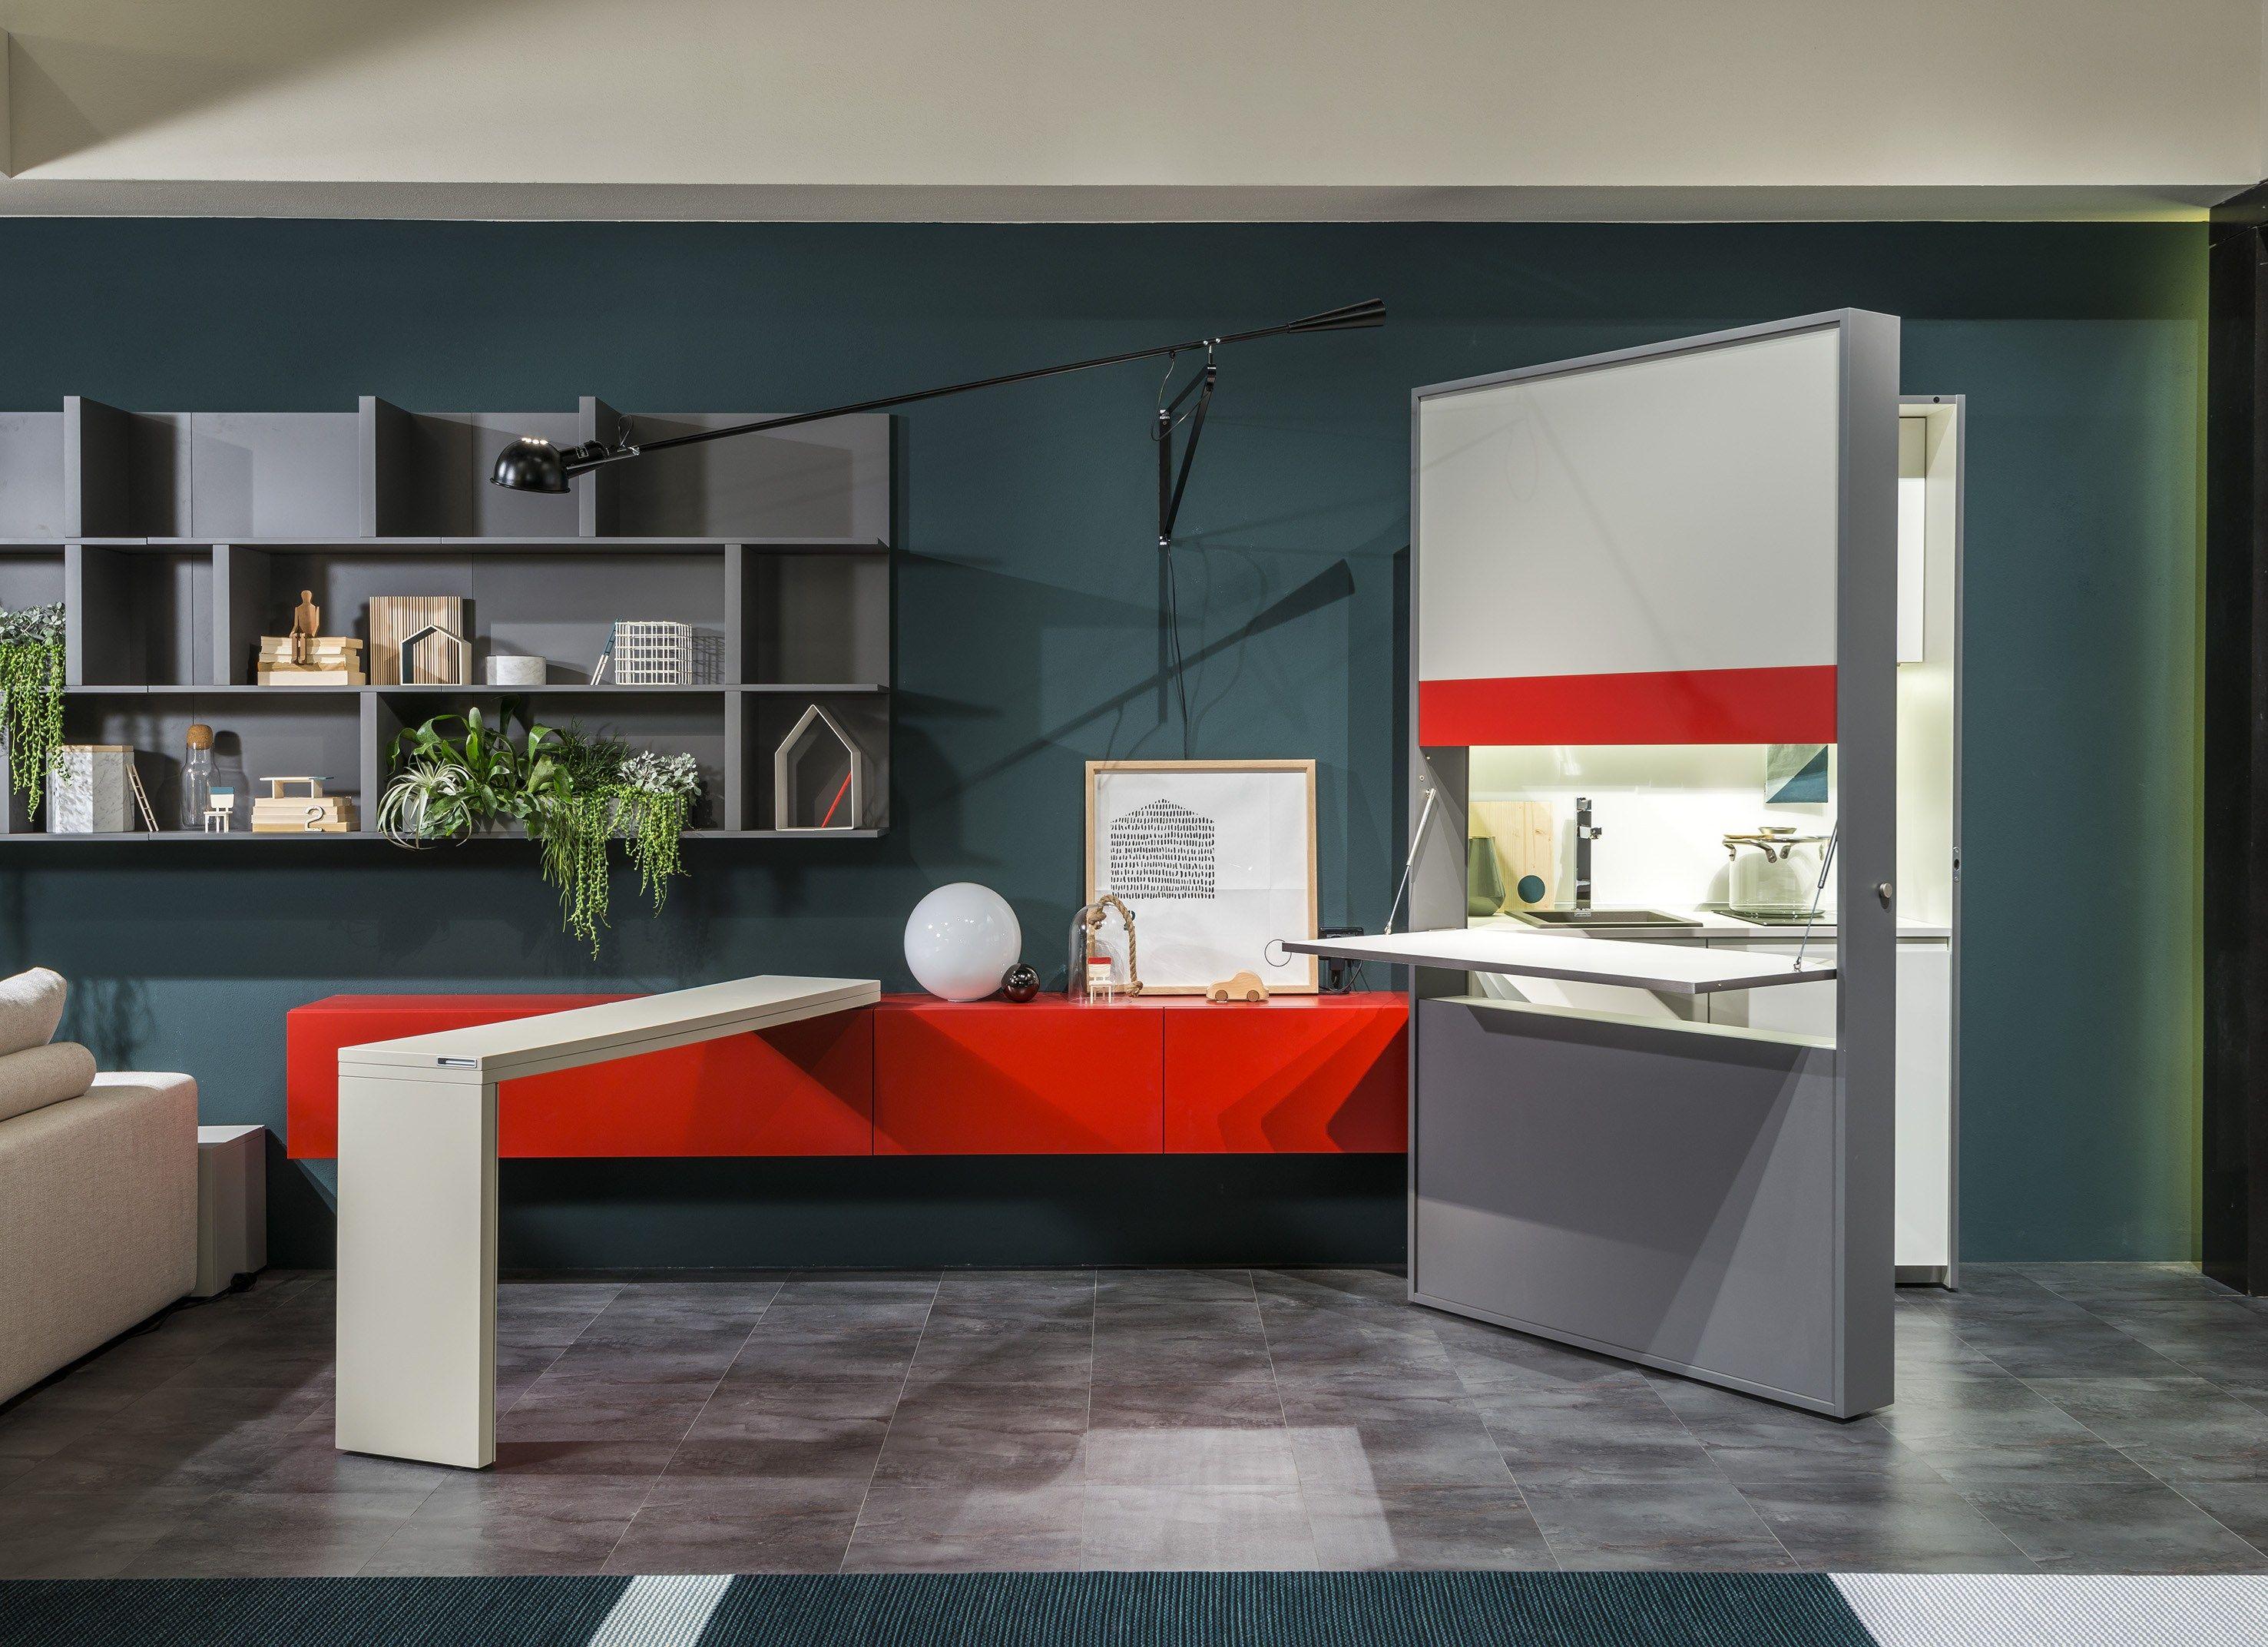 Kitchen Box By Clei Design R&D Clei